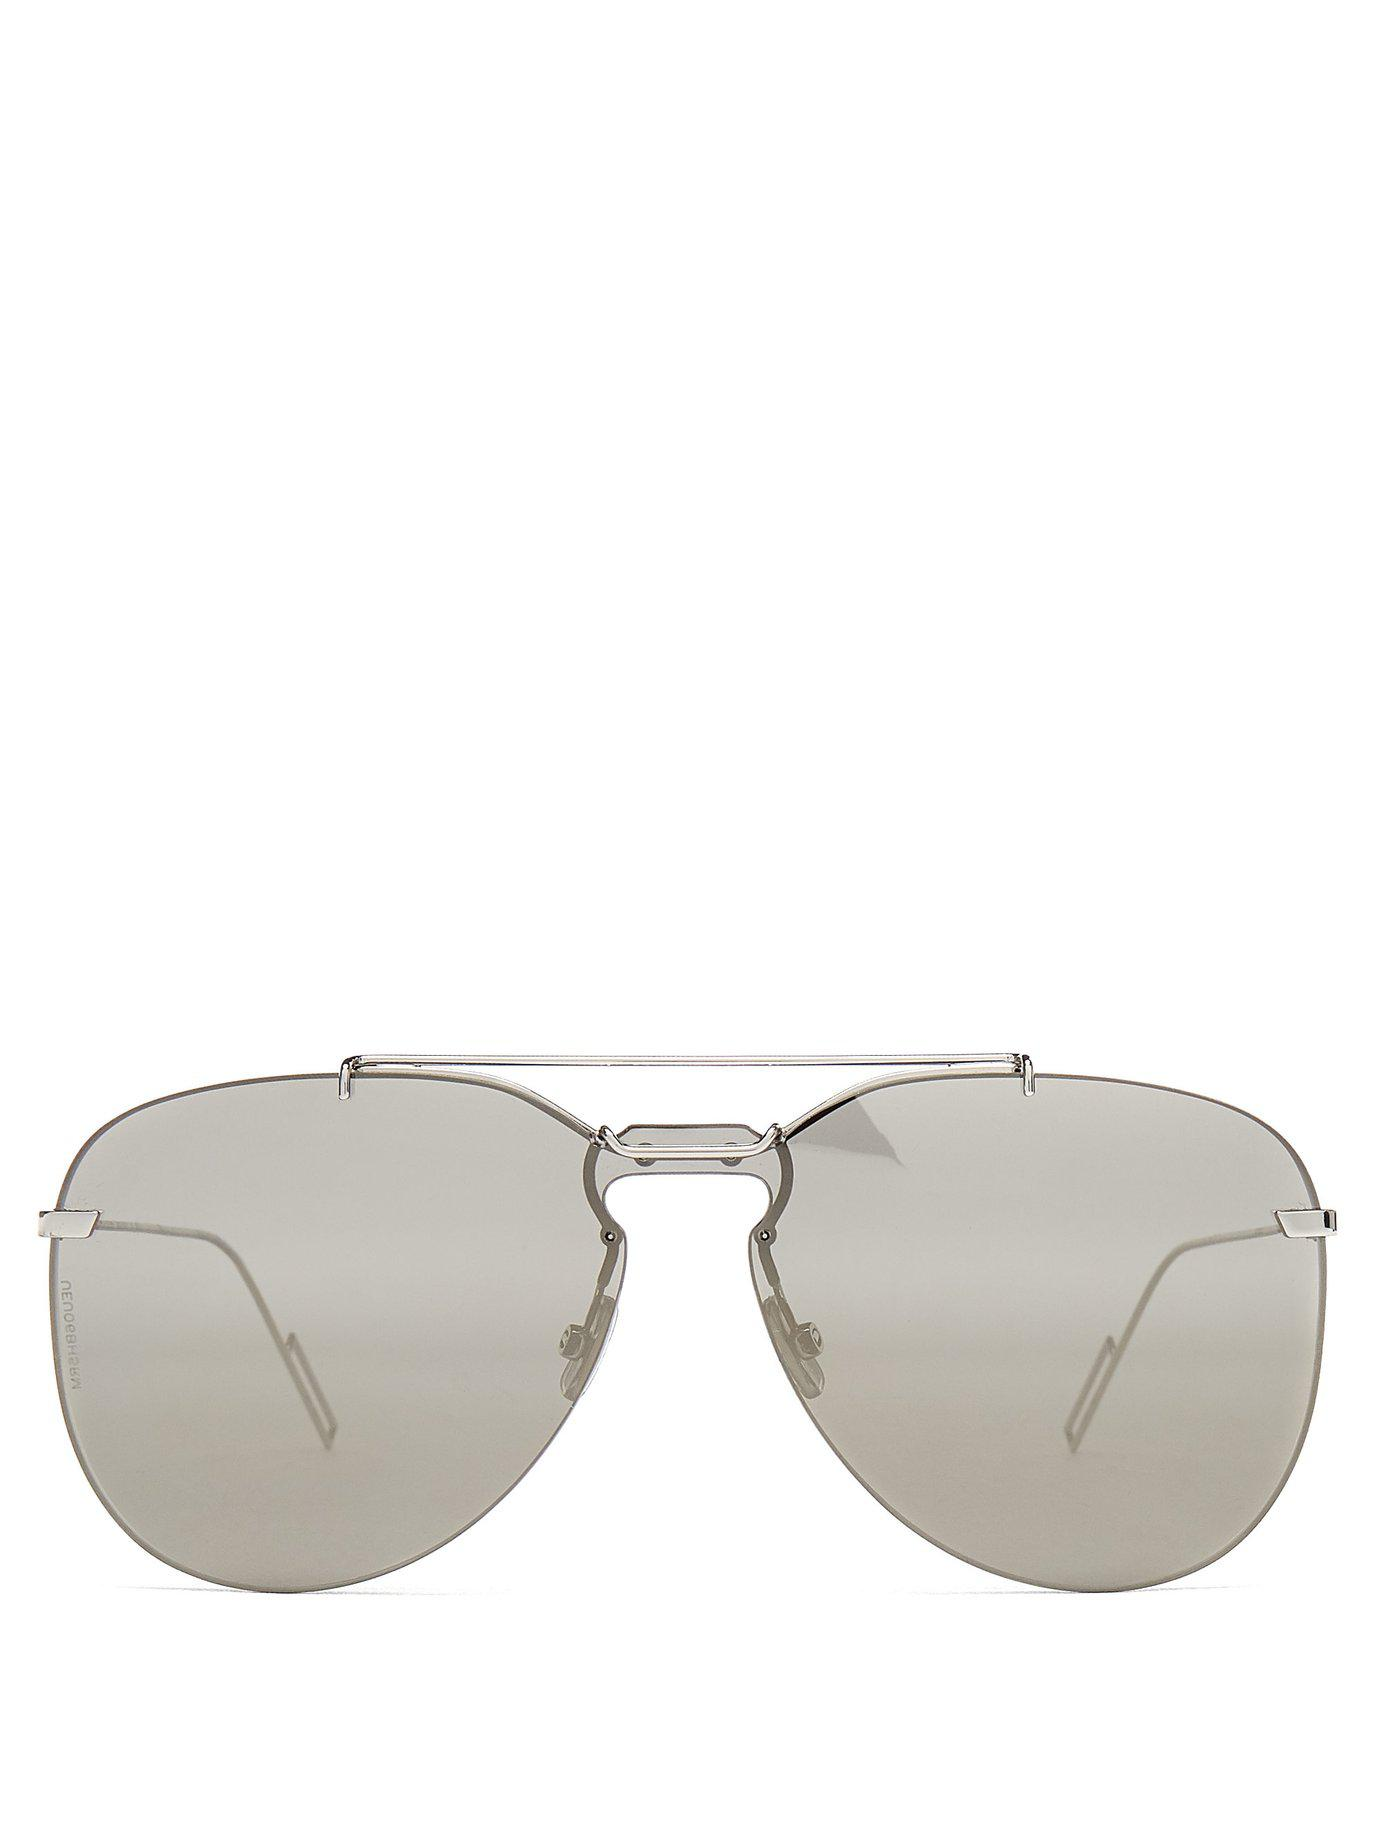 d415d25bdb04 Lyst - Dior Homme Aviator Frame Metal Sunglasses in Metallic for Men